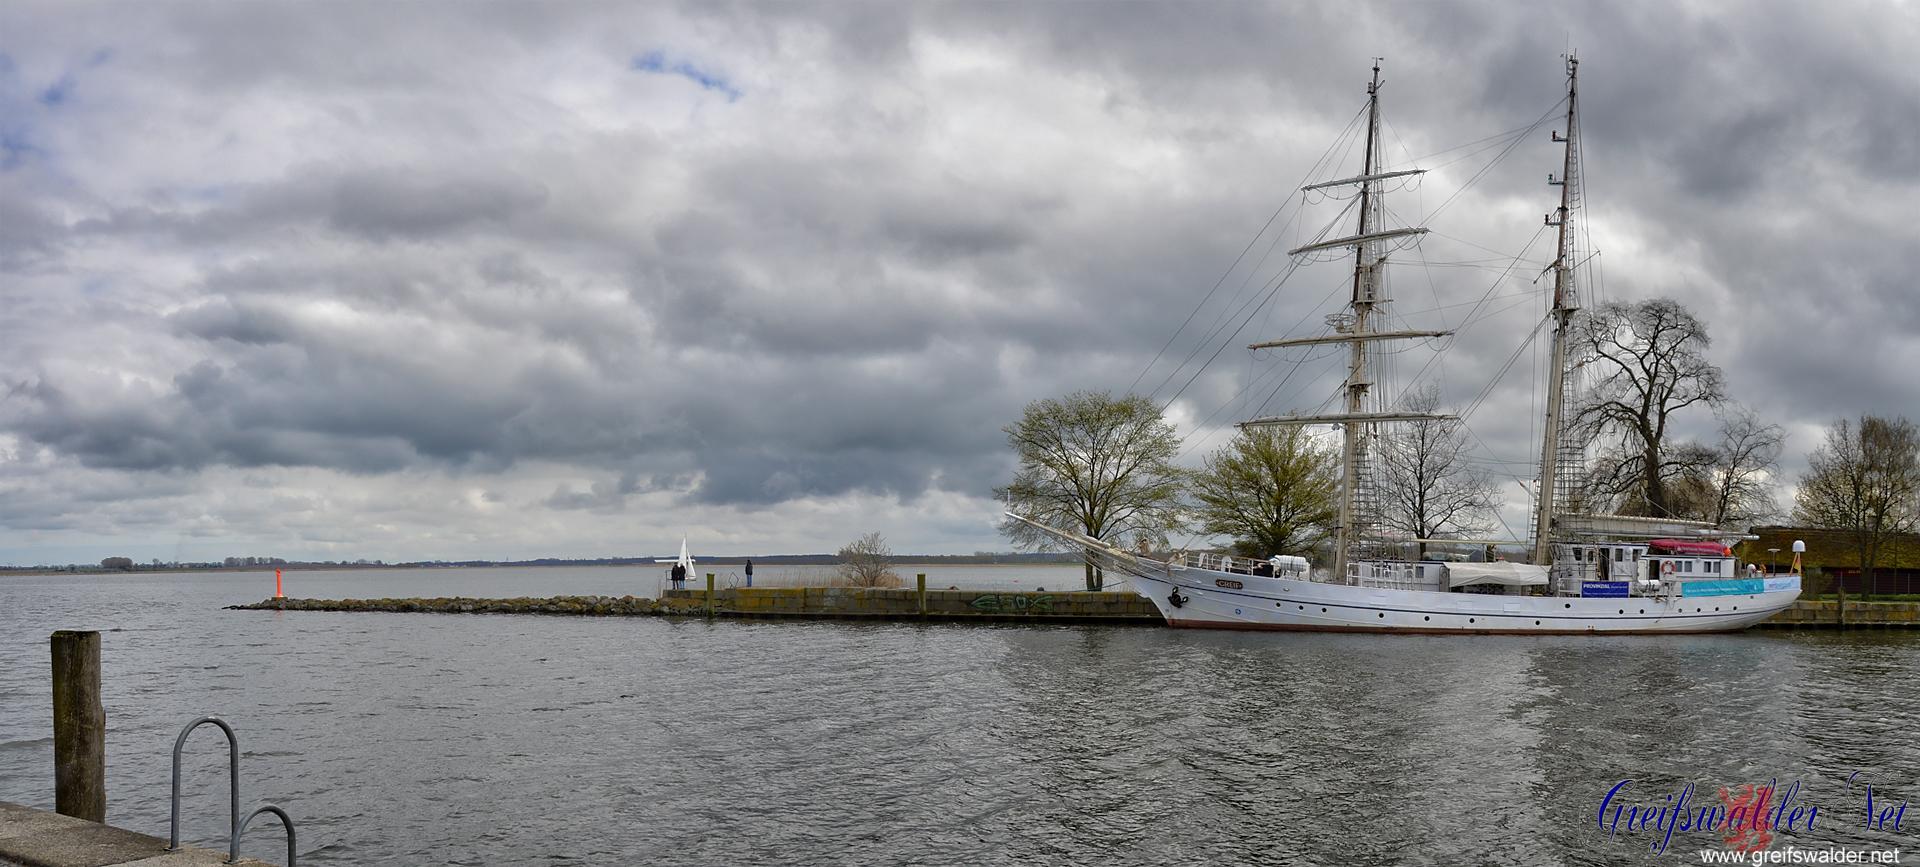 Ostersonntag-Nachmittag in Greifswald-Wieck